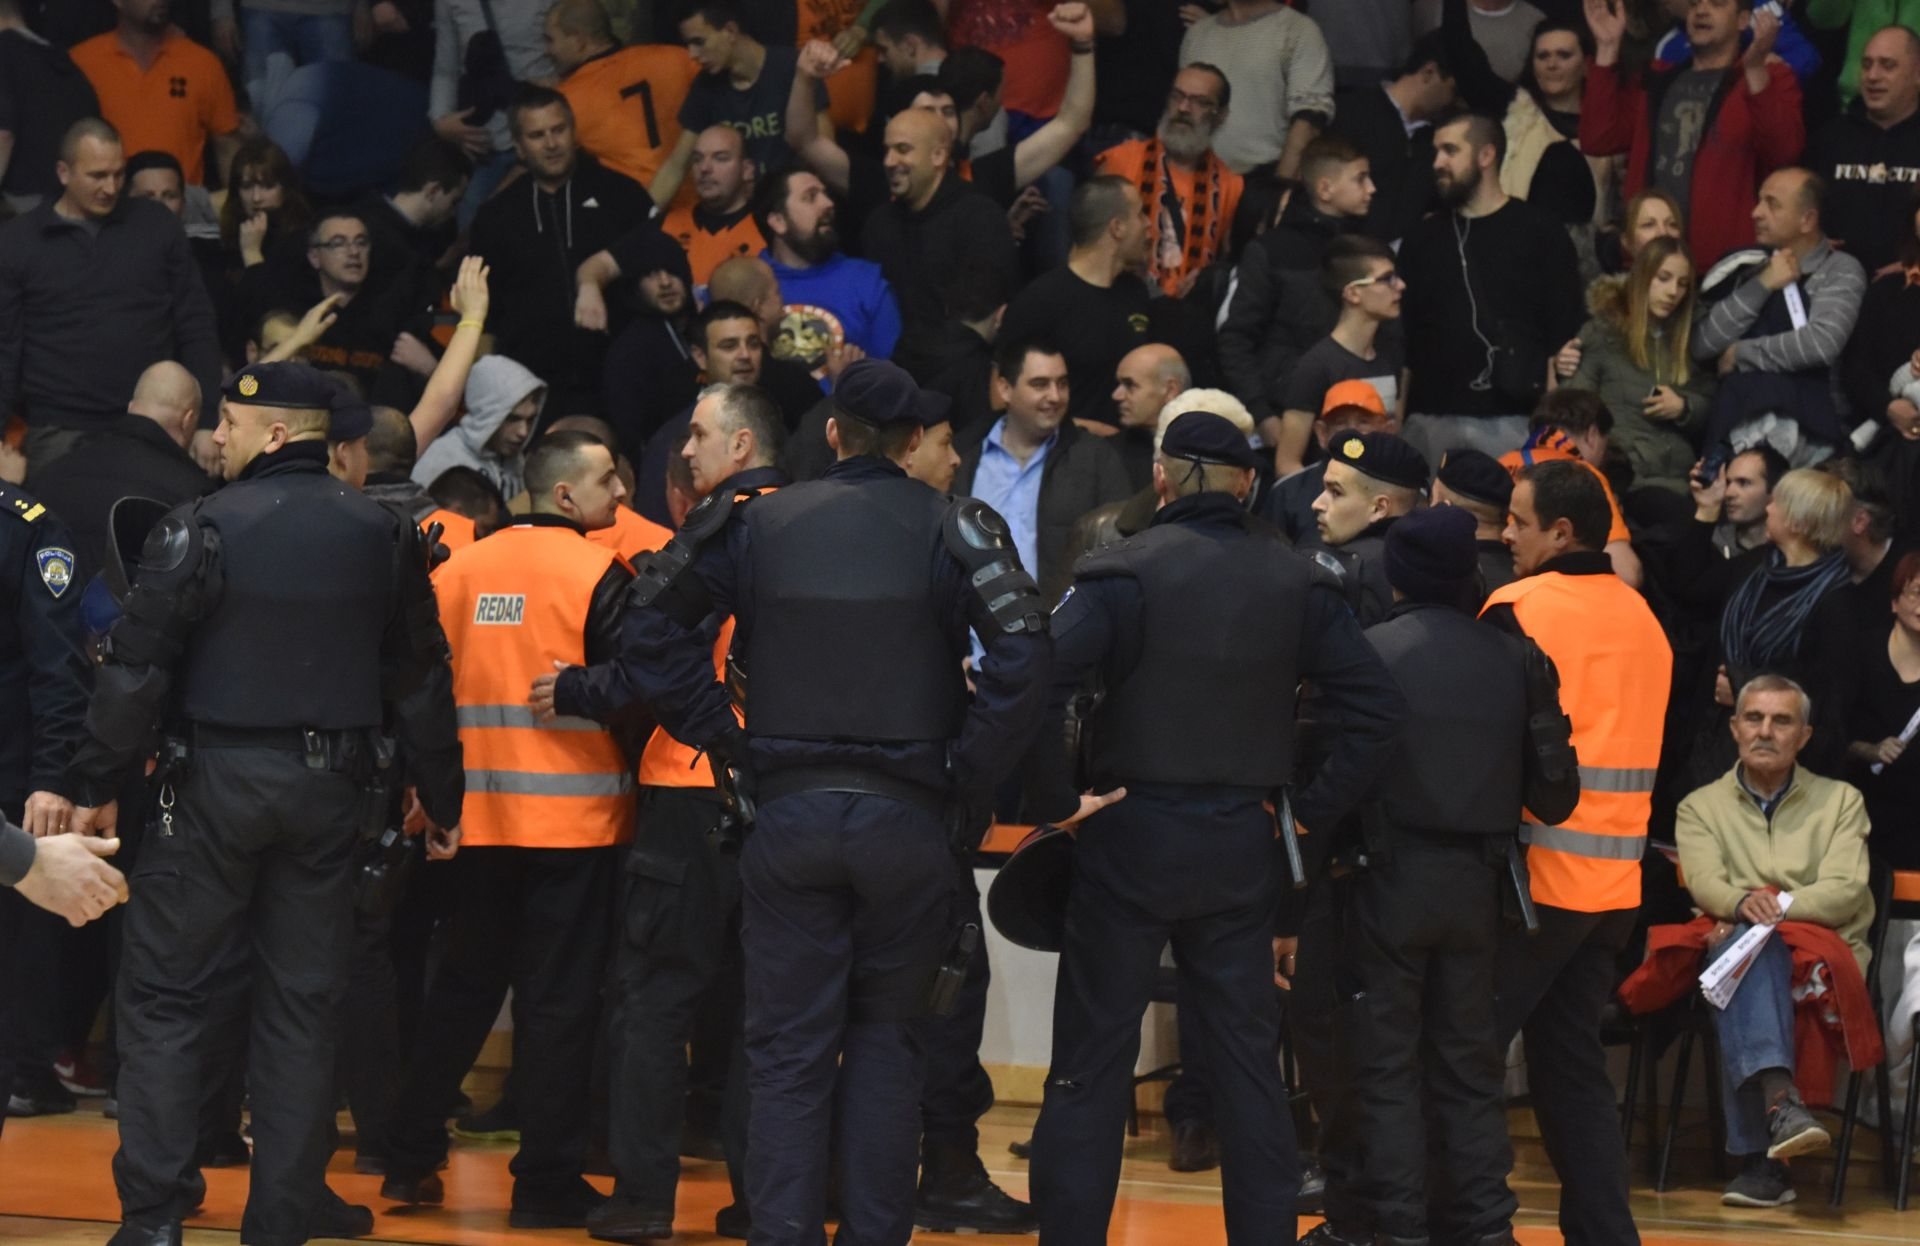 SEDAM PRIVEDENIH: Nedopušten upad na parket na utakmici Šibenik-Zadar